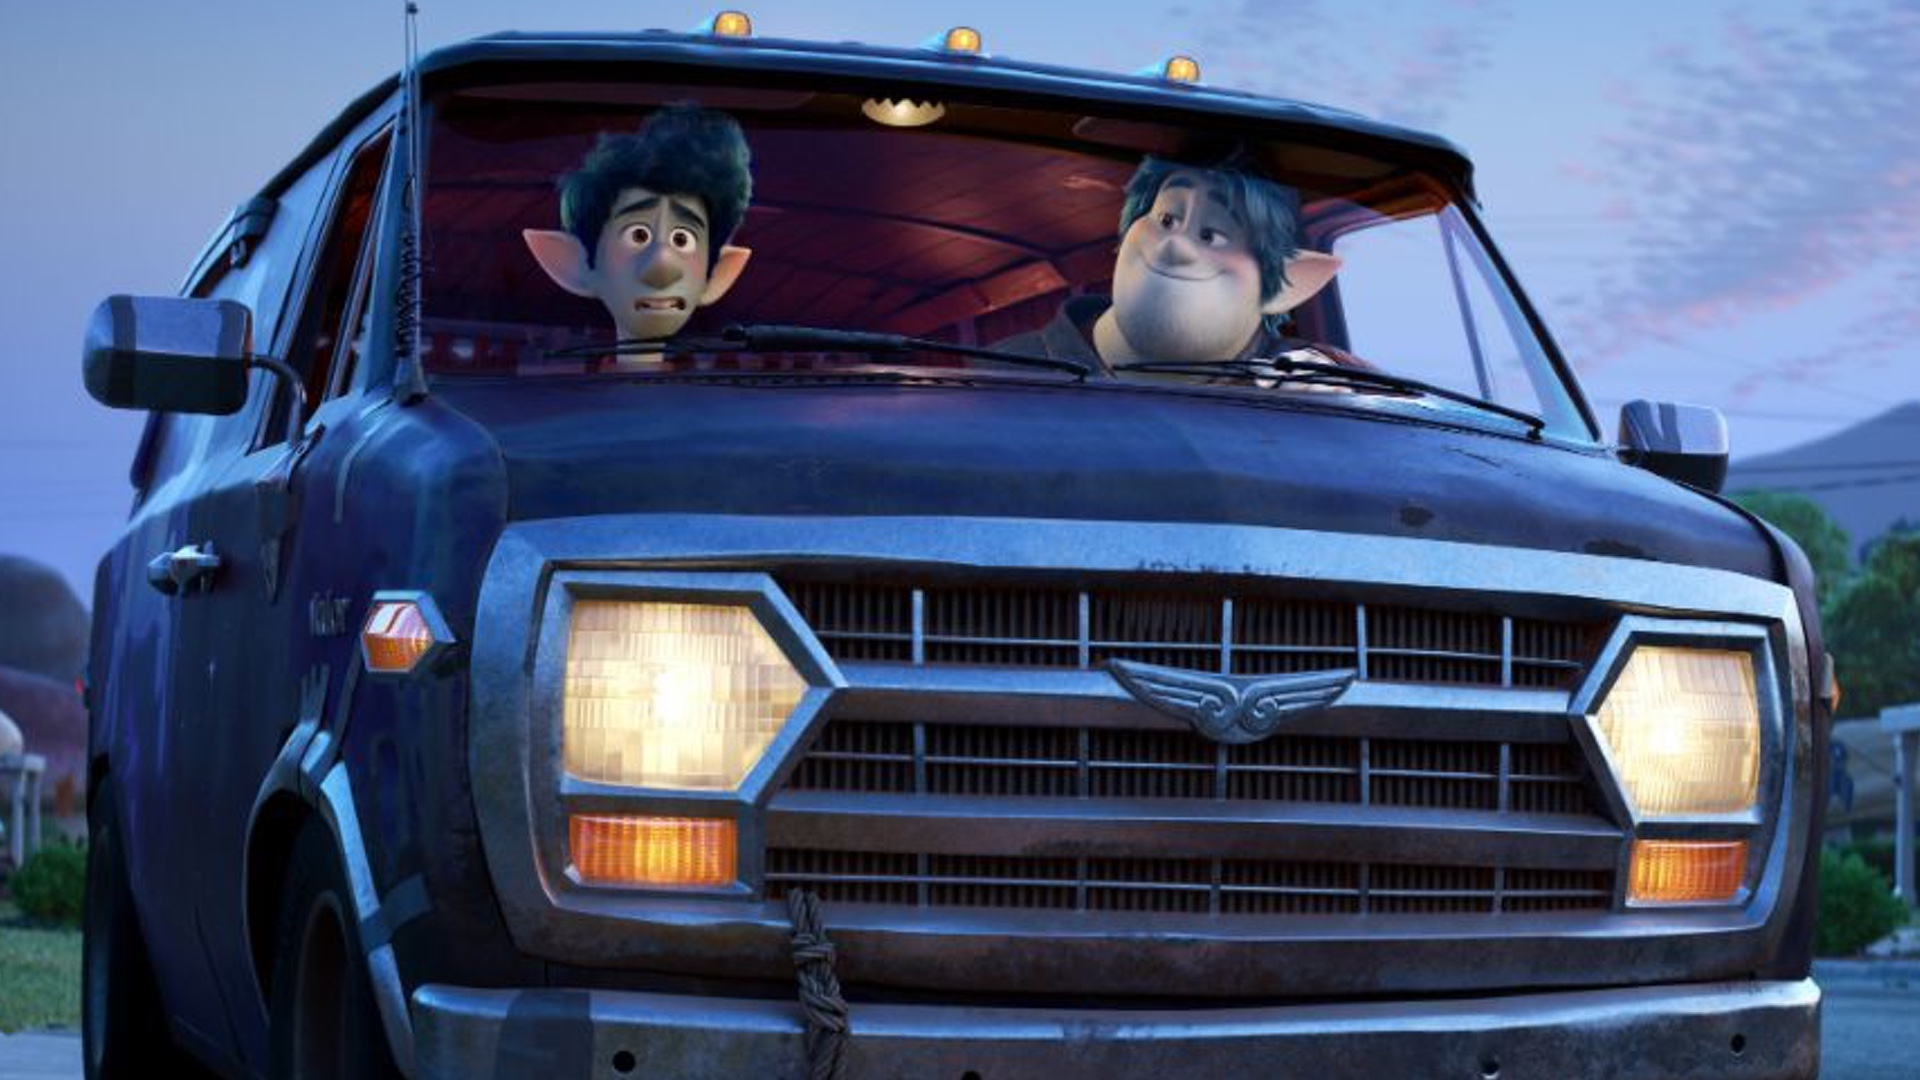 download First Look at Chris Pratt and Tom Hollands Pixar Elf 1920x1080